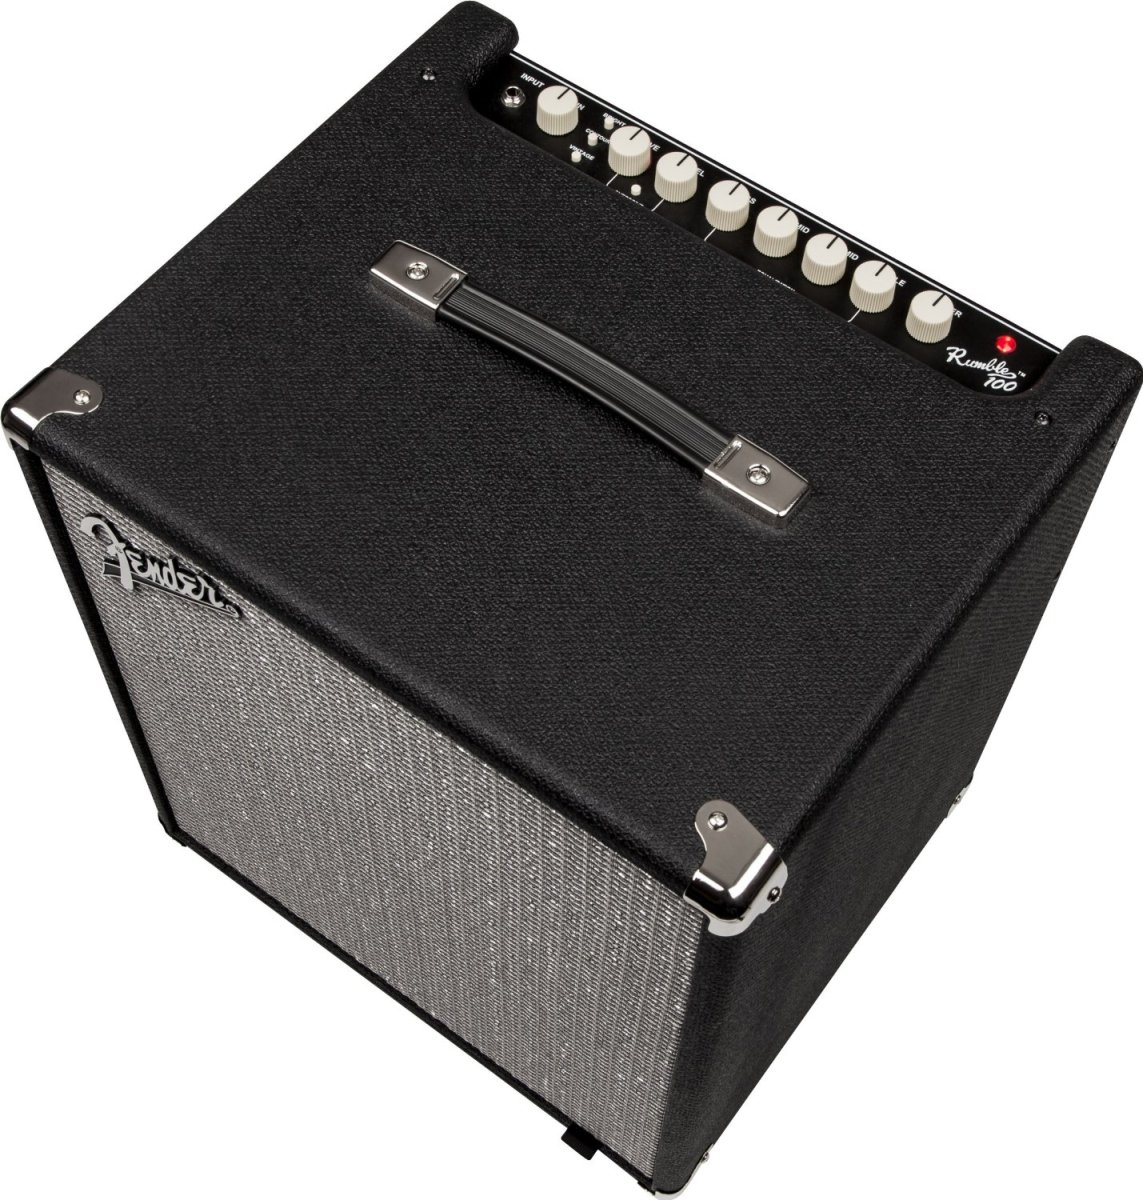 Fender Rumble 100 Bass Combo Amp